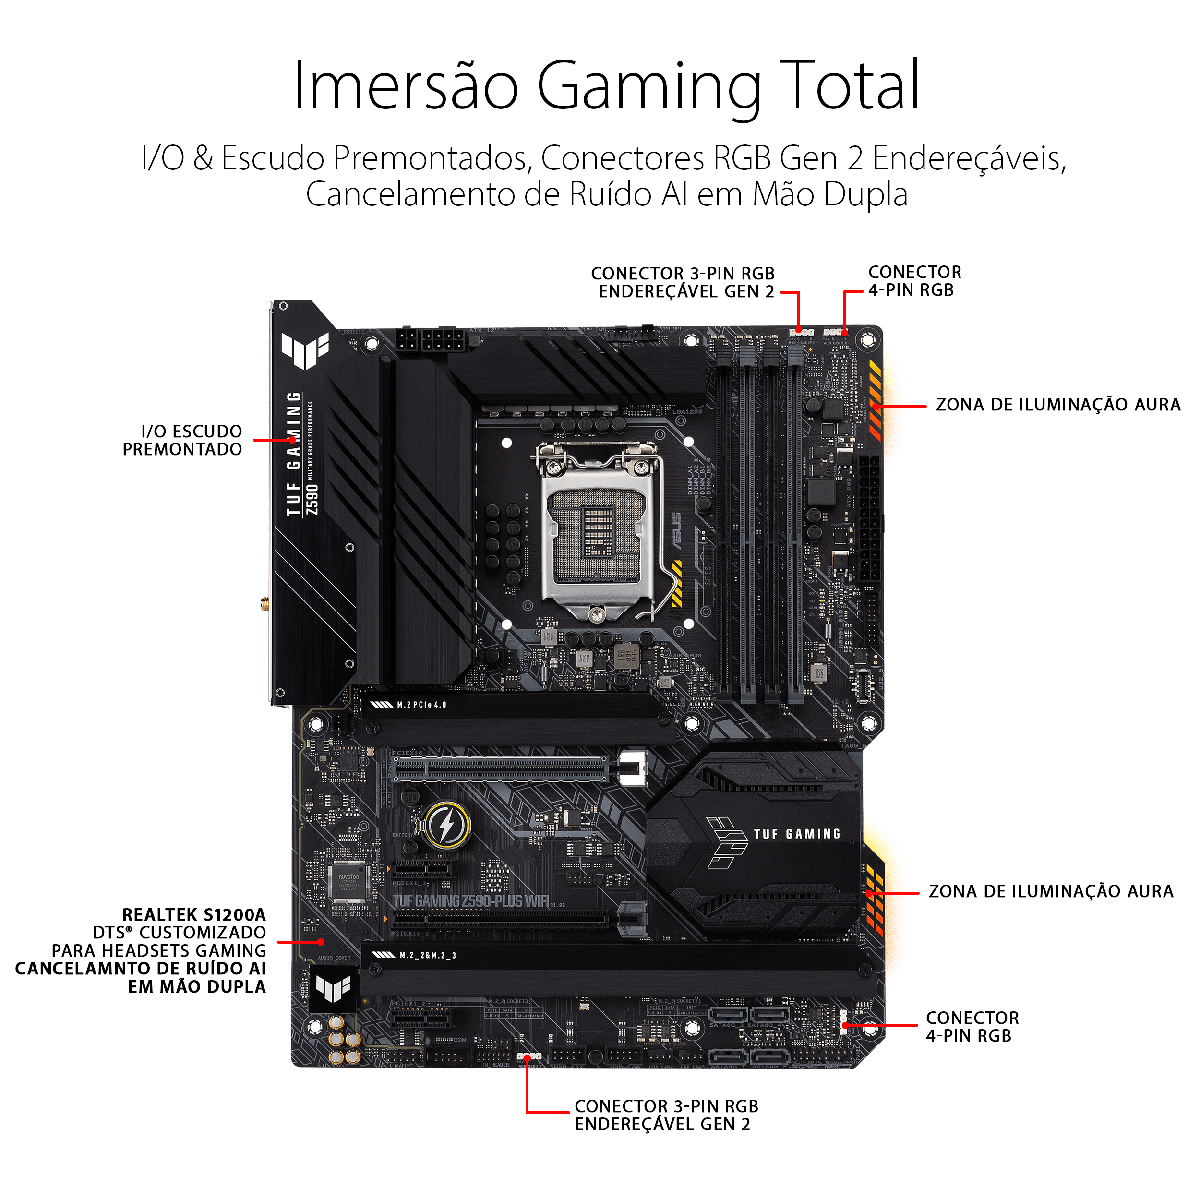 Placa Mãe Asus TUF Gaming Z590-Plus WIFI, Chipset Z590, Intel LGA 1200, ATX, DDR4, TUF GAMING Z590-PLUS WIFI